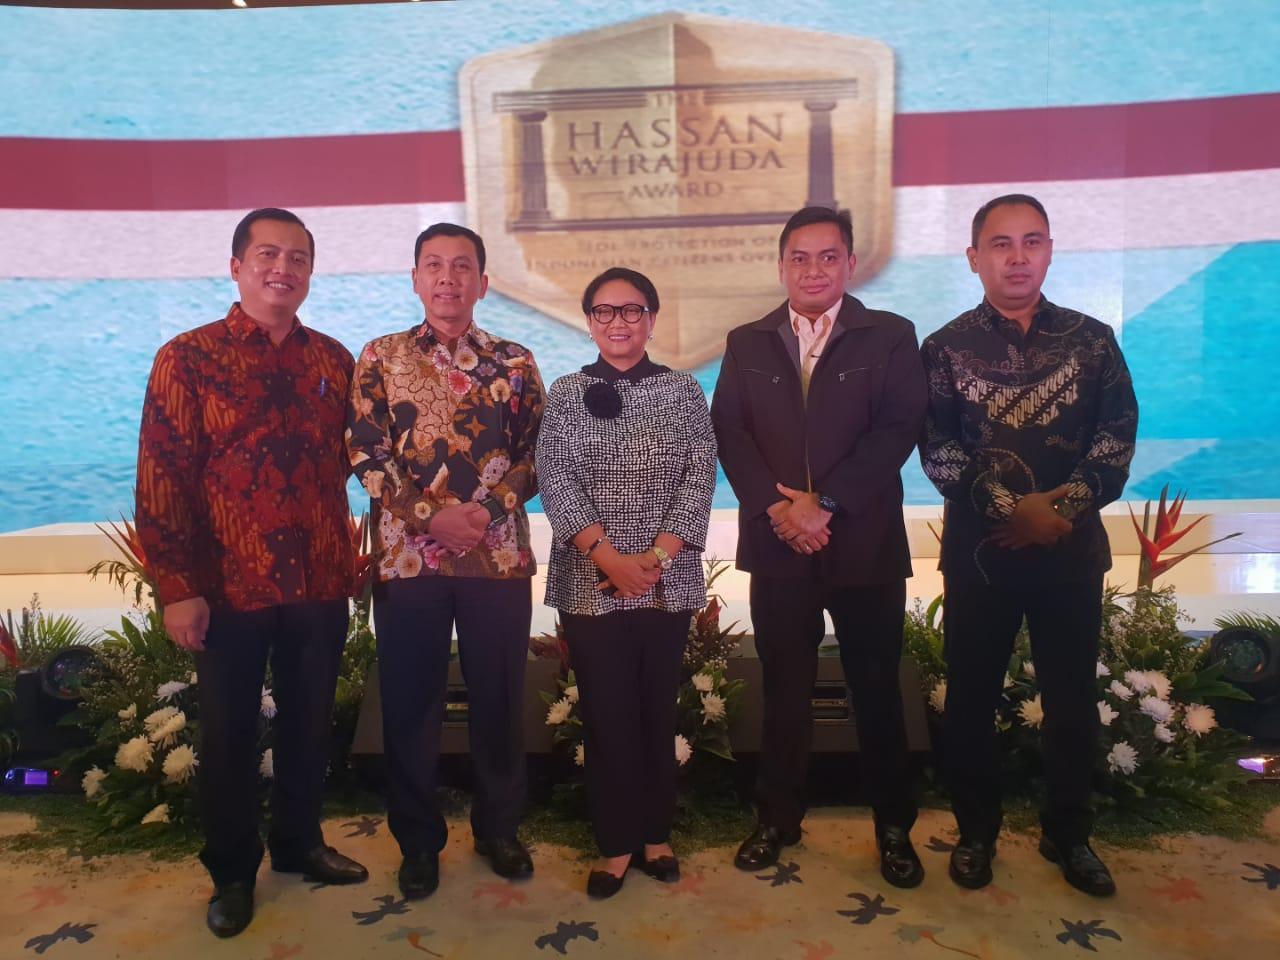 "Polda NTB Menerima Penghargaan ""Hasan Wirayuda Award Perlindungan TKI 2018"""